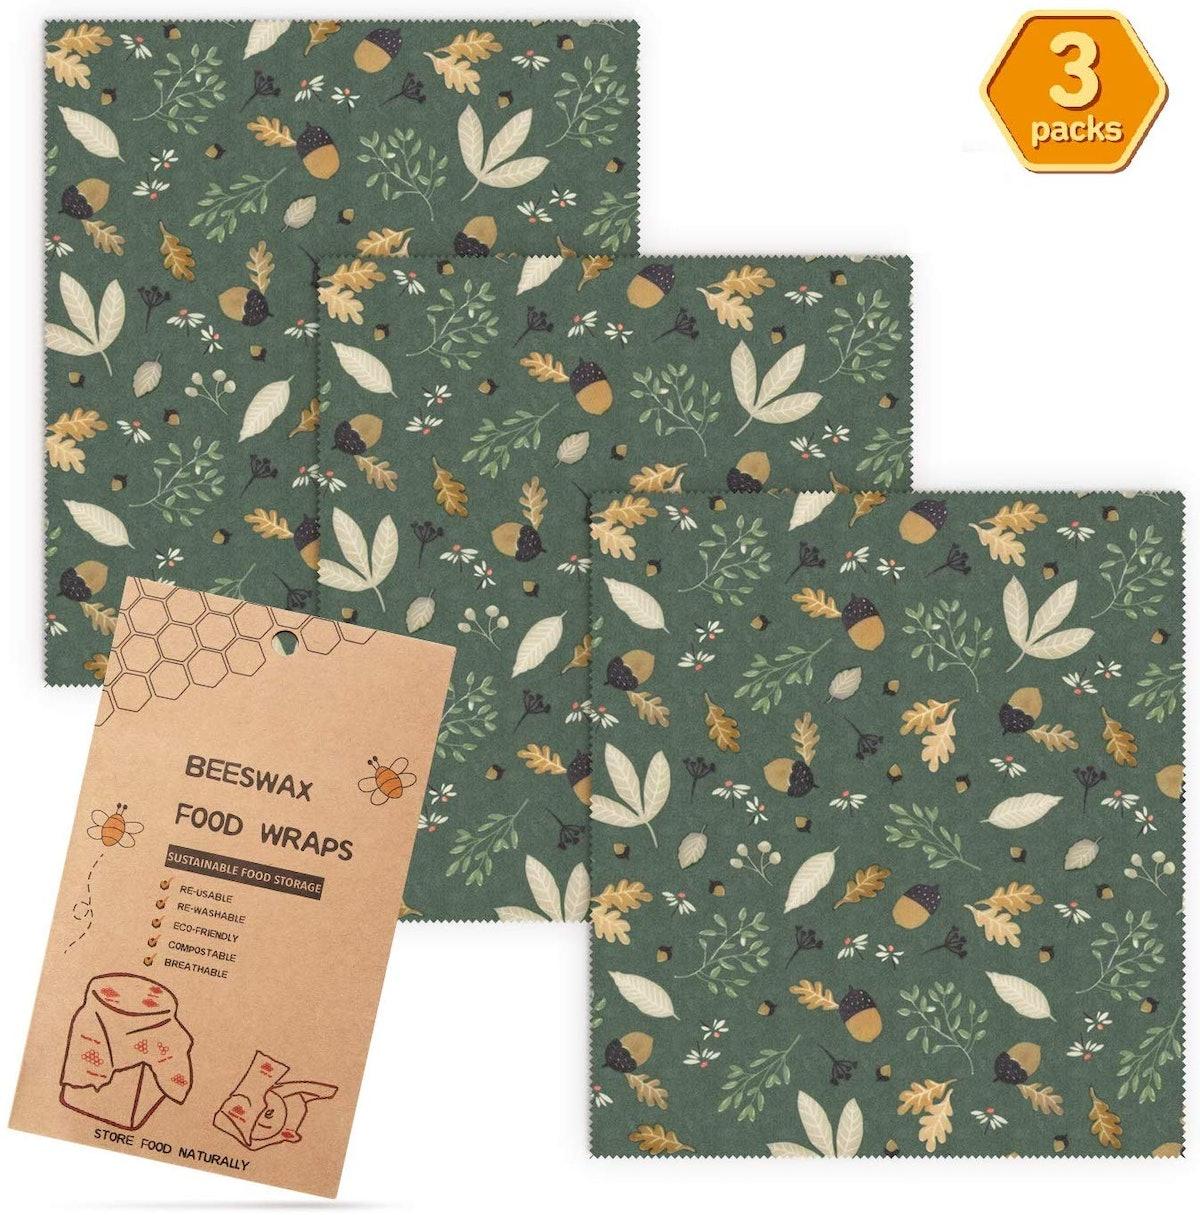 Beeswax Wrap Reusable Food Wrap (3-Pack)